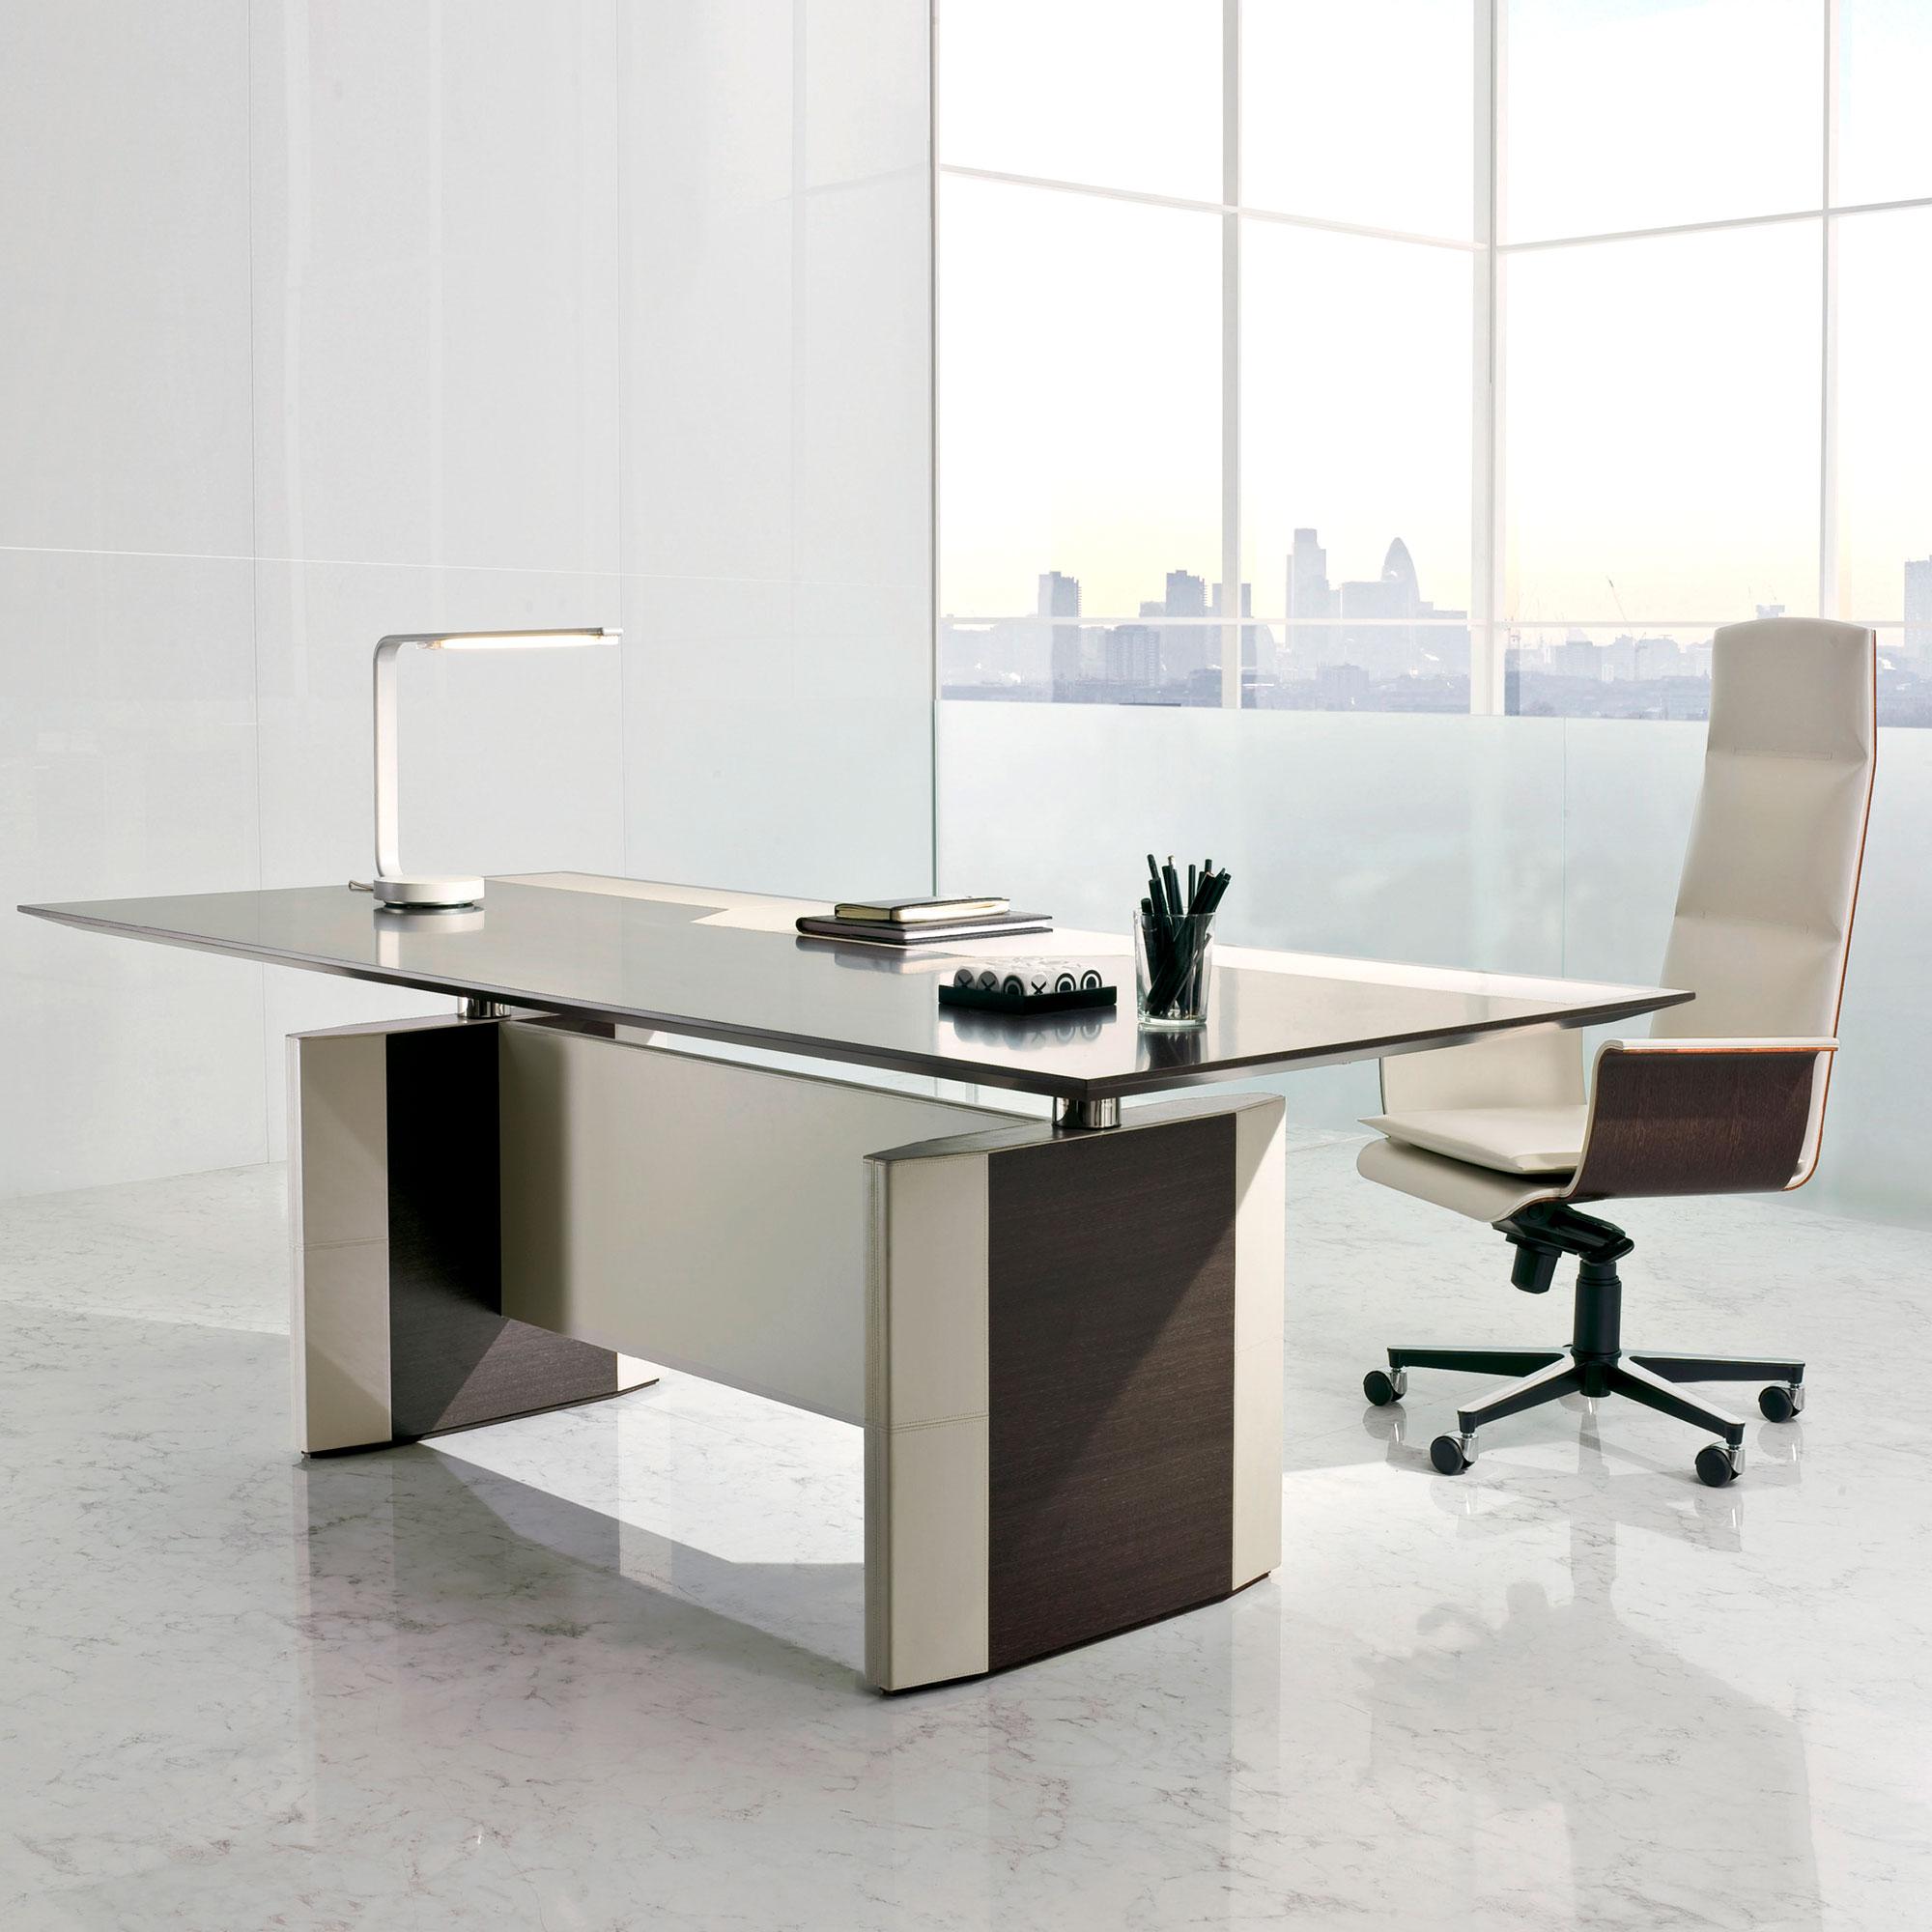 Stupendous De Symetria Luxury Contemporary Italian Desk Italian Complete Home Design Collection Papxelindsey Bellcom